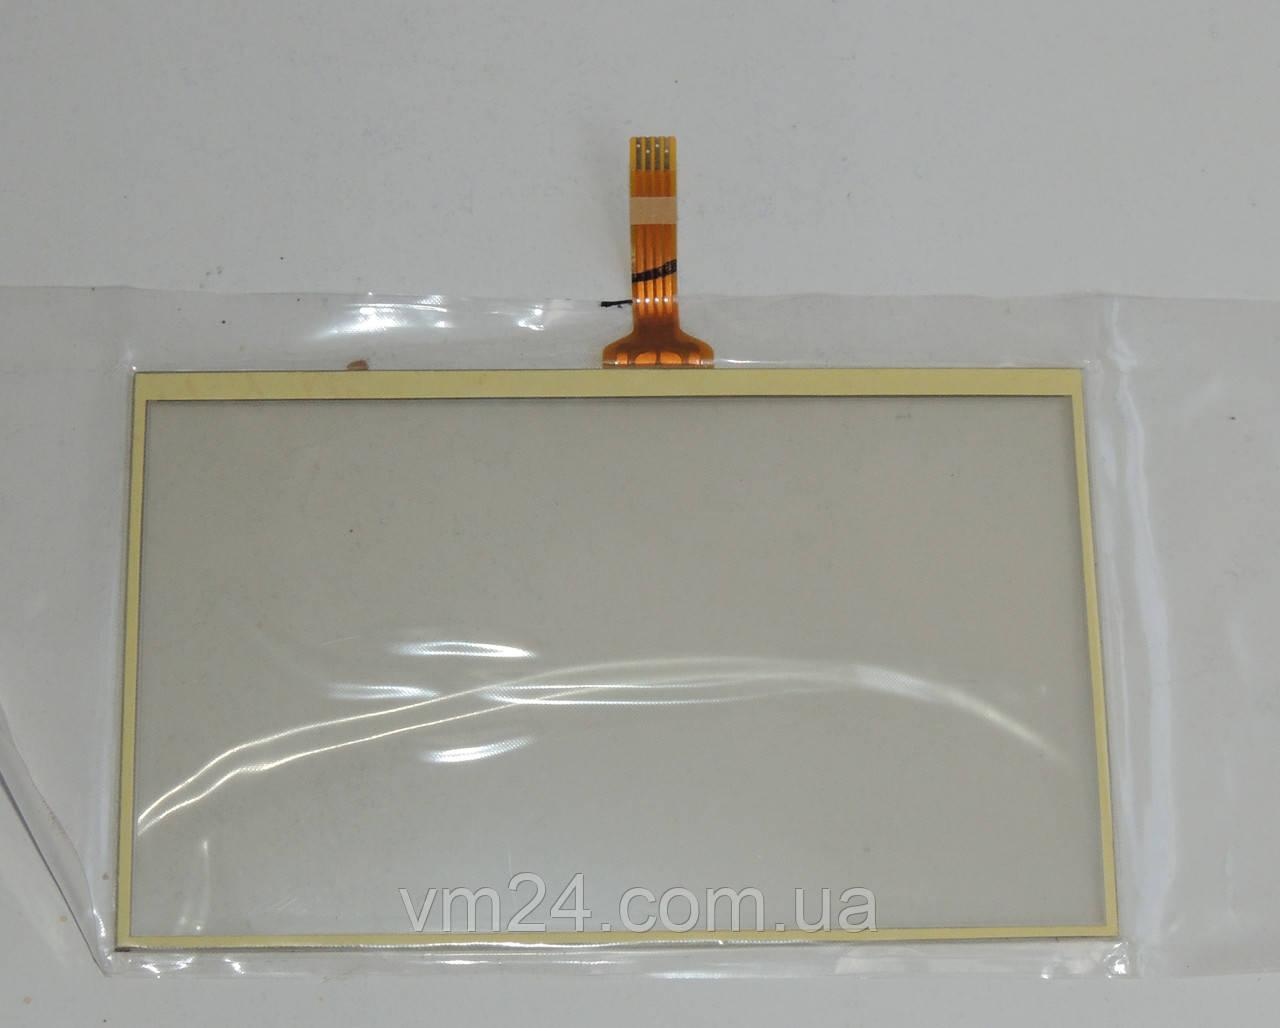 Тачскрин (сенсор) для GPS навигатора Размер 102X62mm